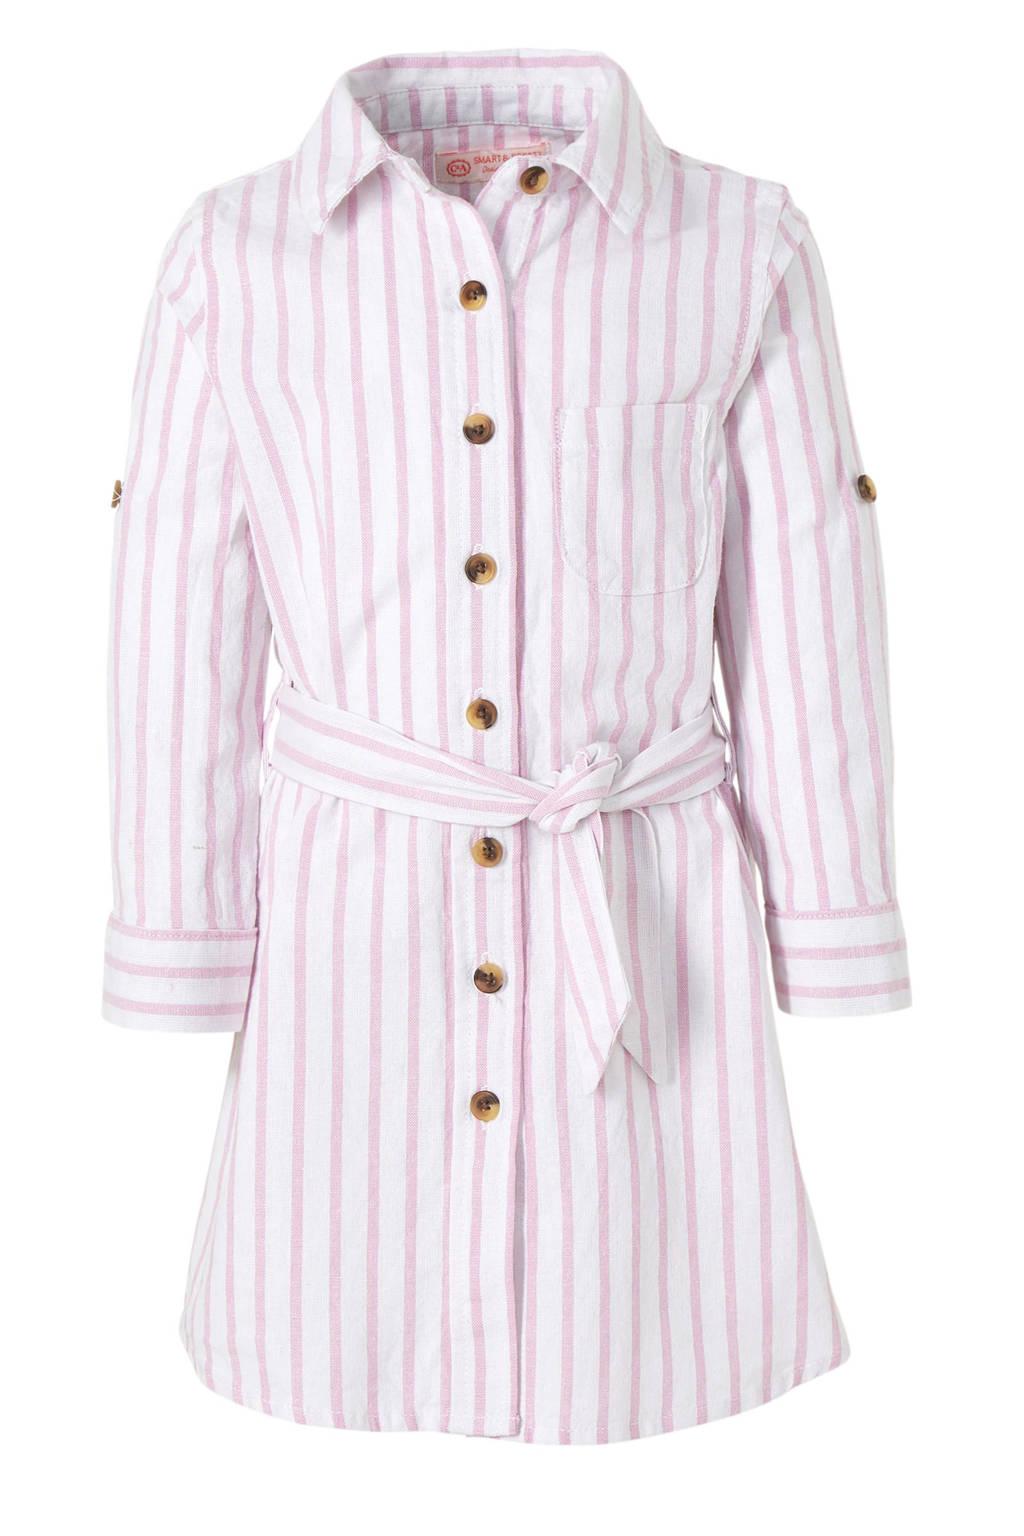 6da244eef1c155 C A gestreepte blousejurk roze